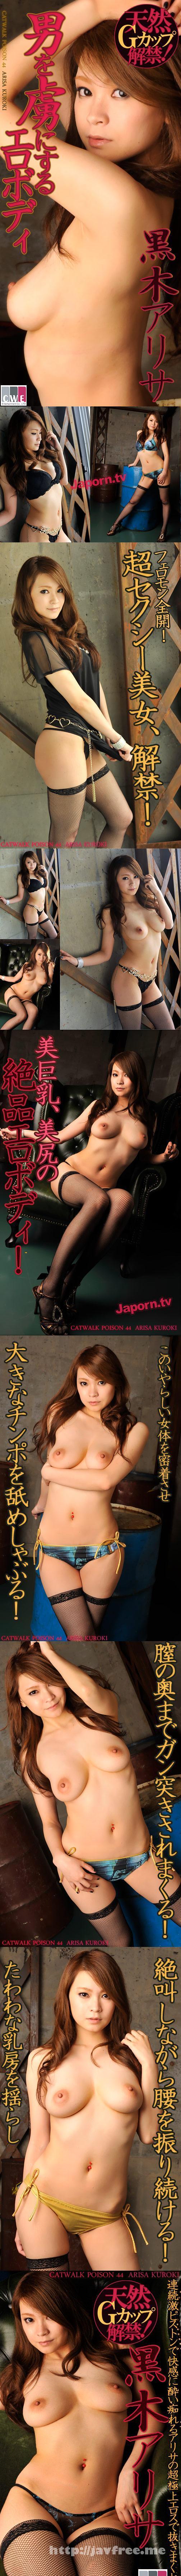 [CWP 44] キャットウォーク ポイズン 44 : 黒木アリサ 黒木アリサ CWP Arisa Kuroki